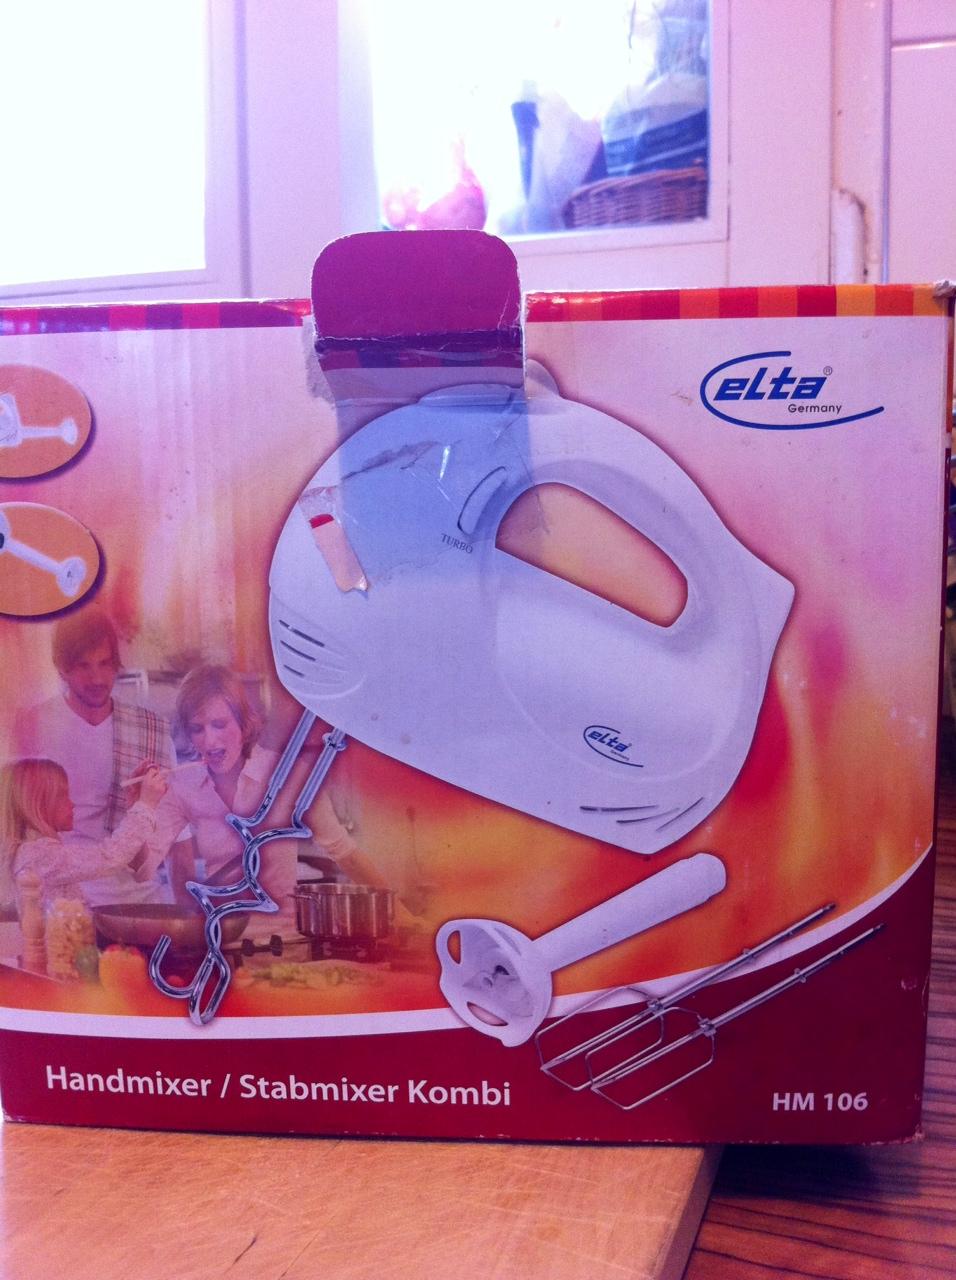 Nützliche Küchengeräte - inspiration4fitness